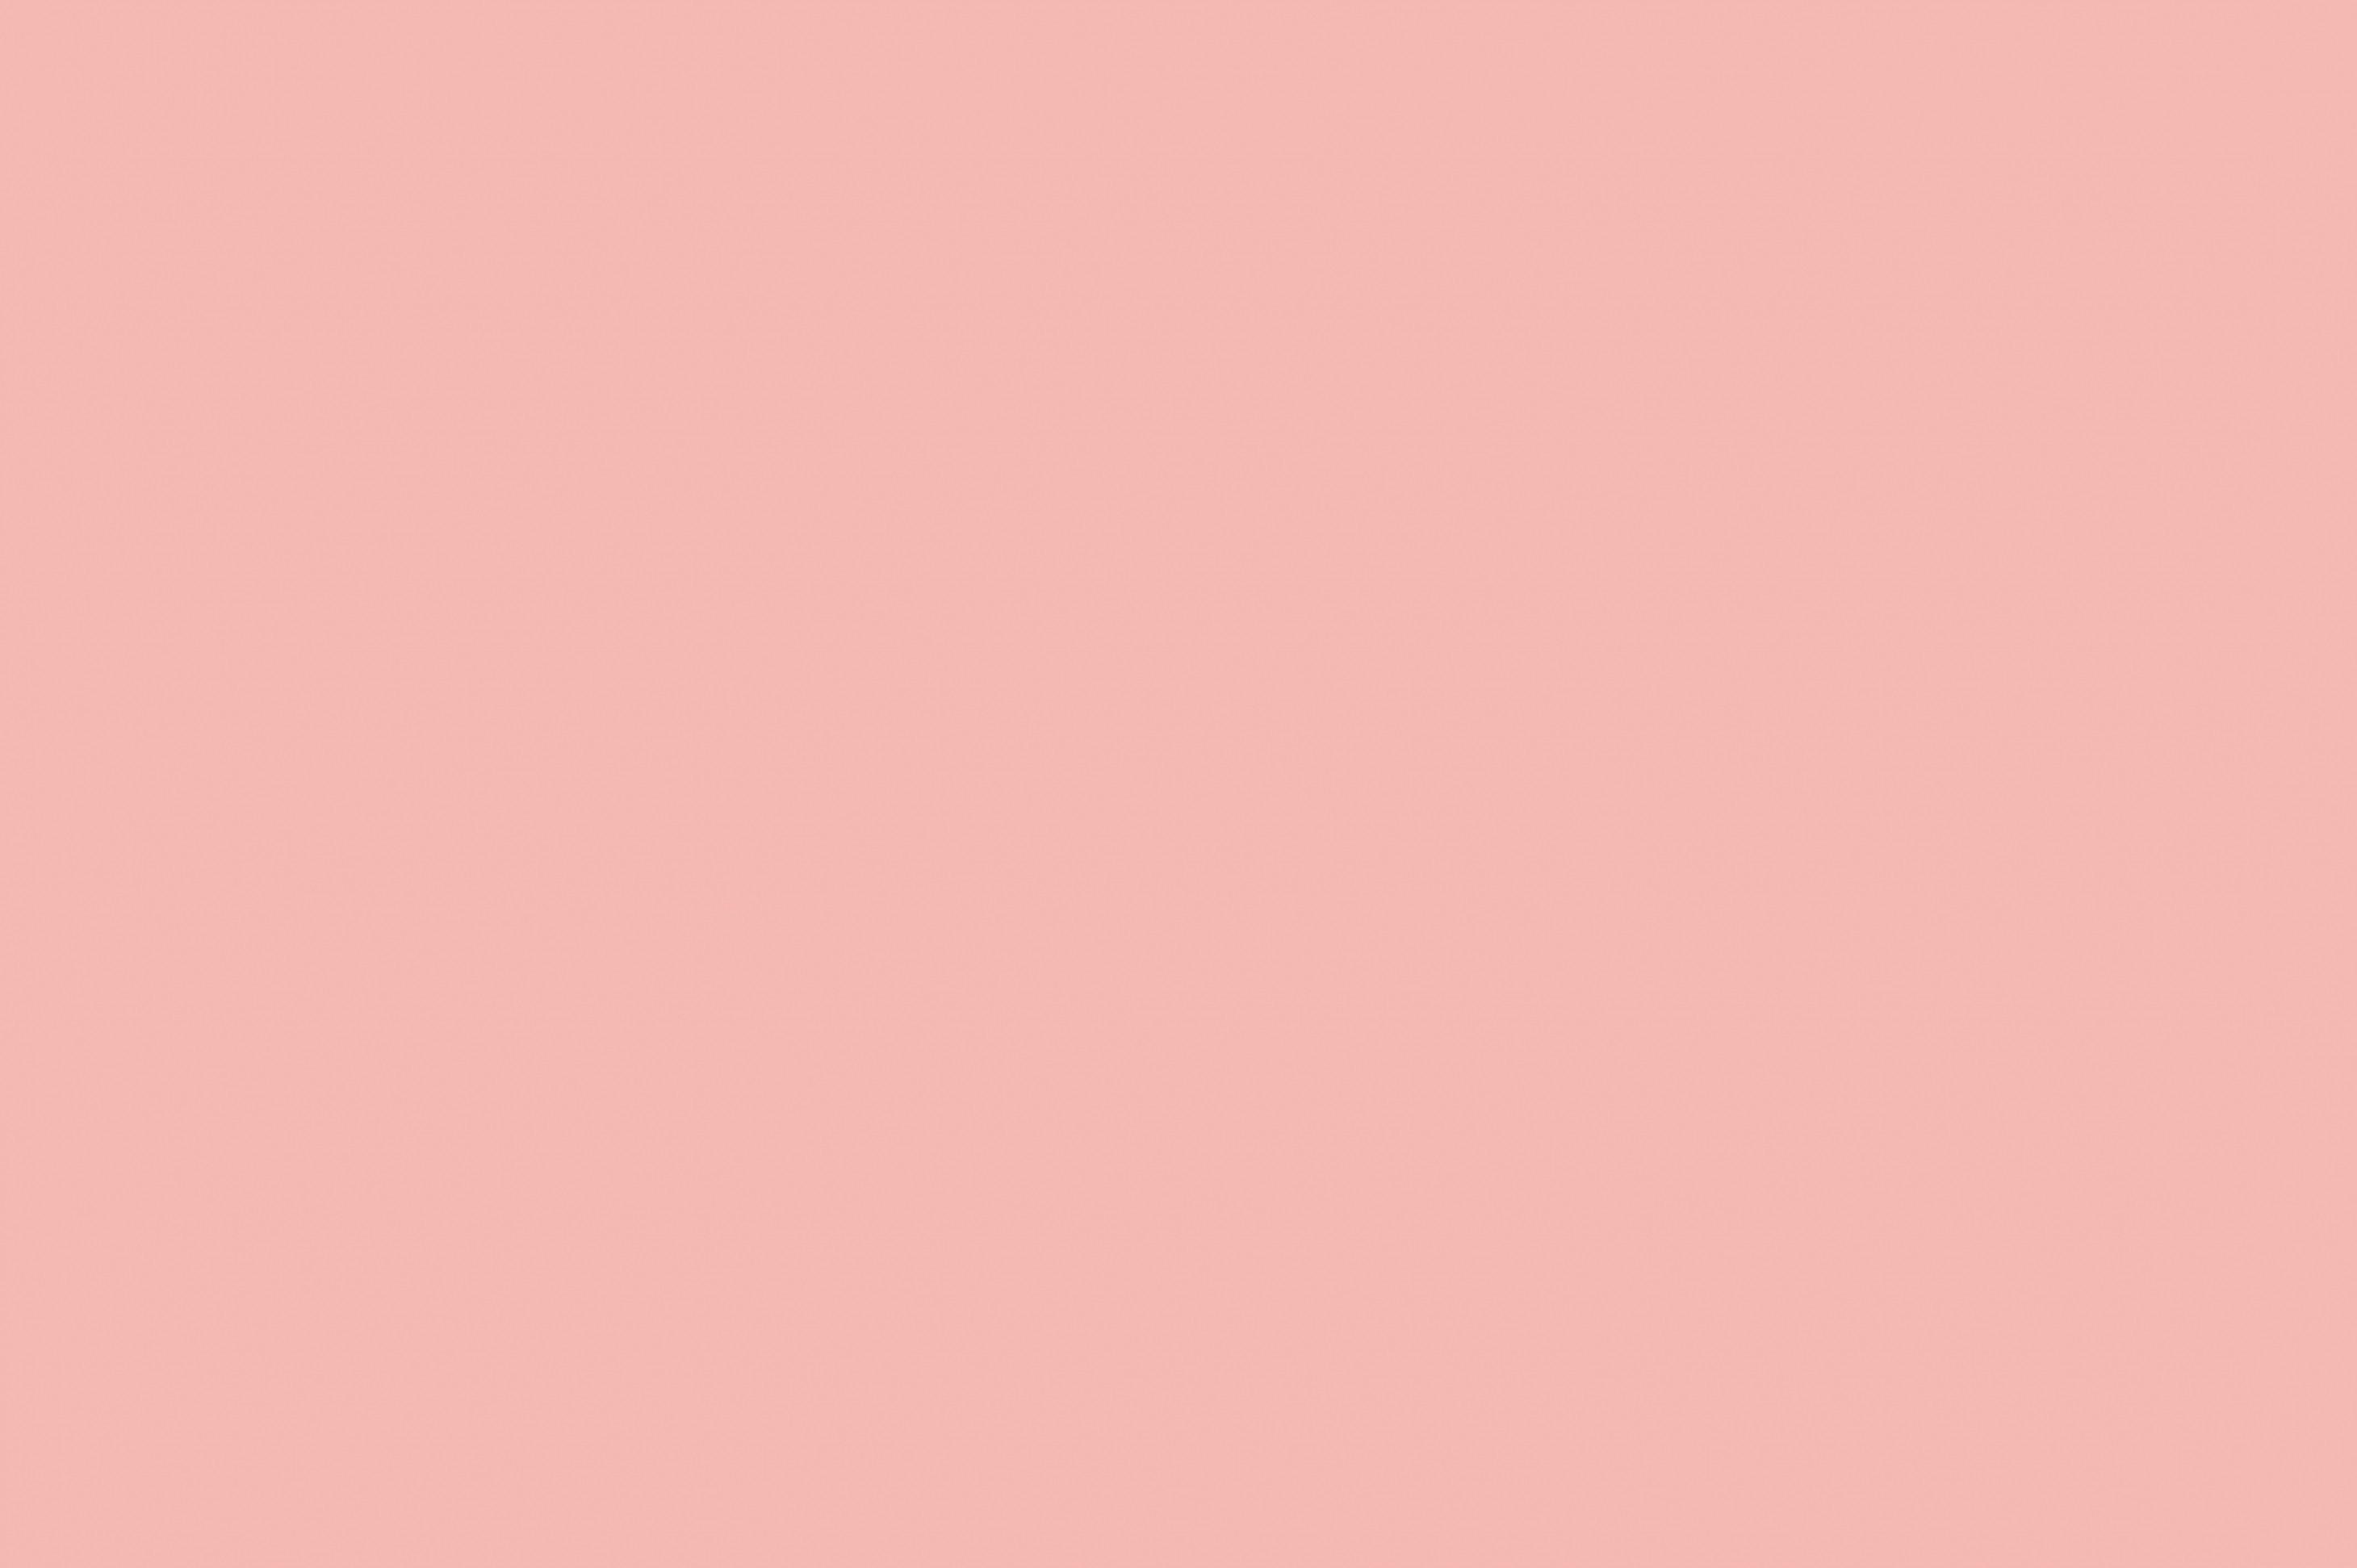 Plain Pastel Color Wallpaper Hd Hd Blast